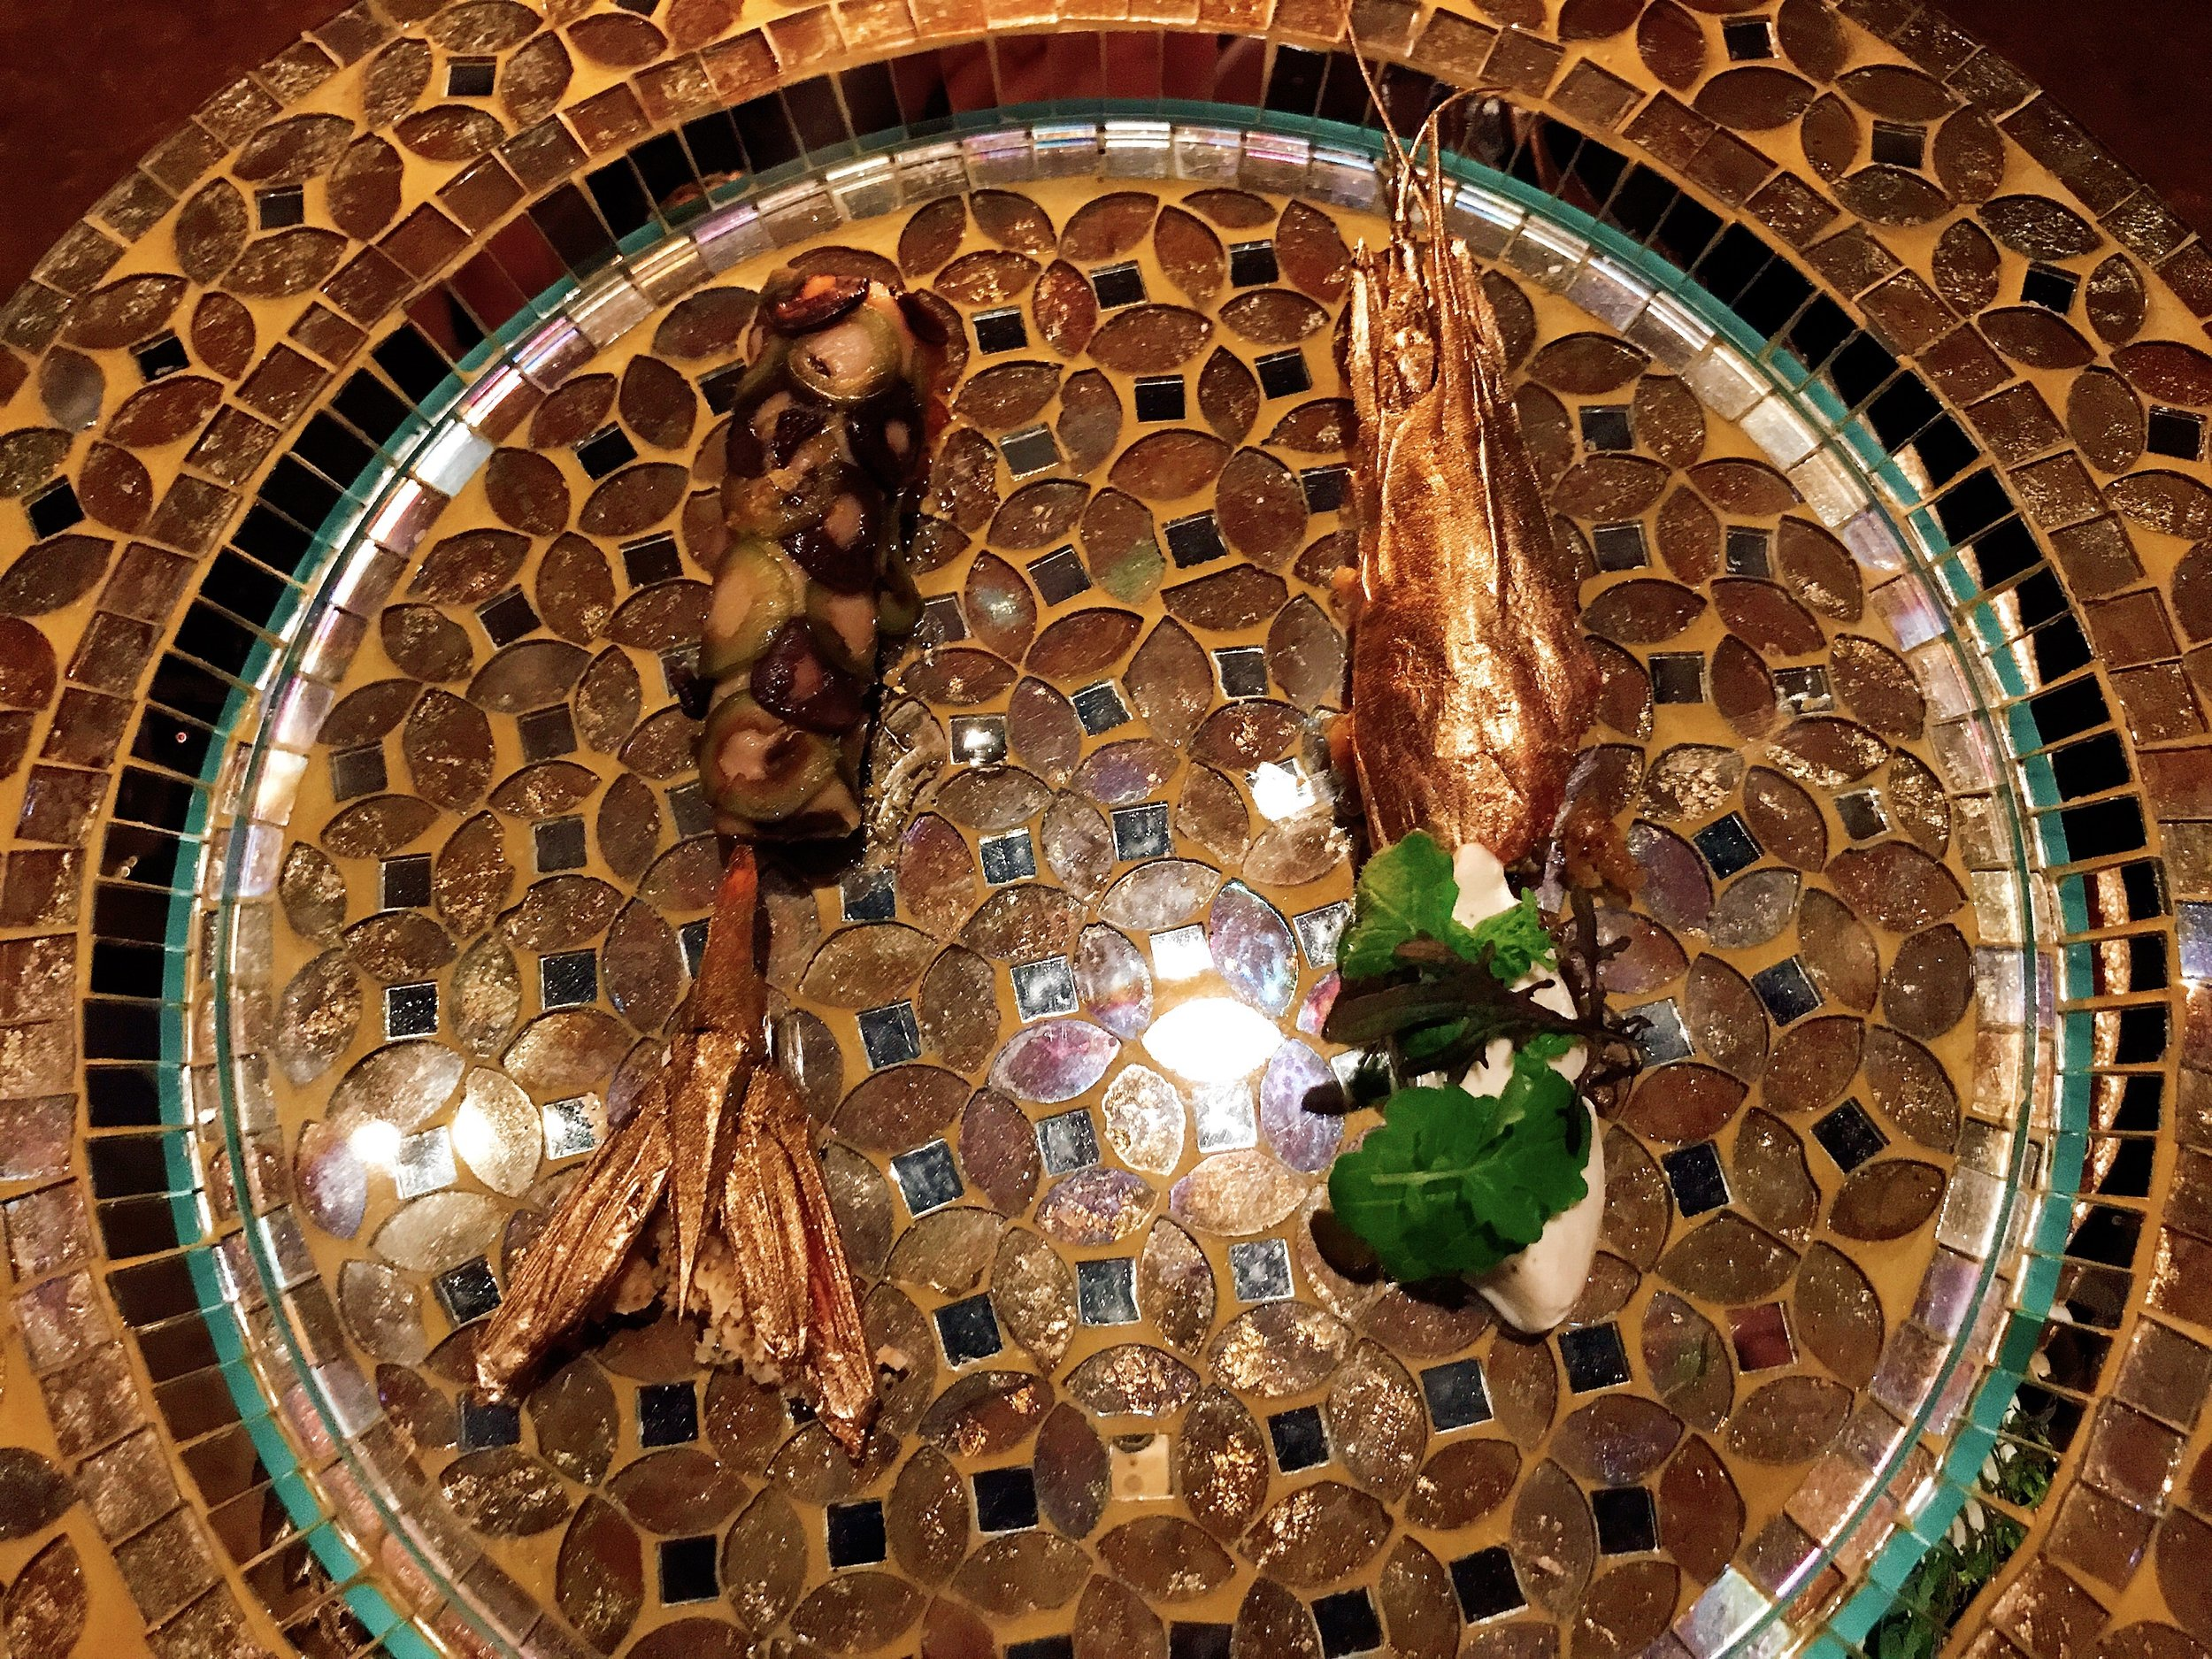 Isicia De Scillis Vel De cammaris Amplis (39): Shrimp, Olives and Walnut